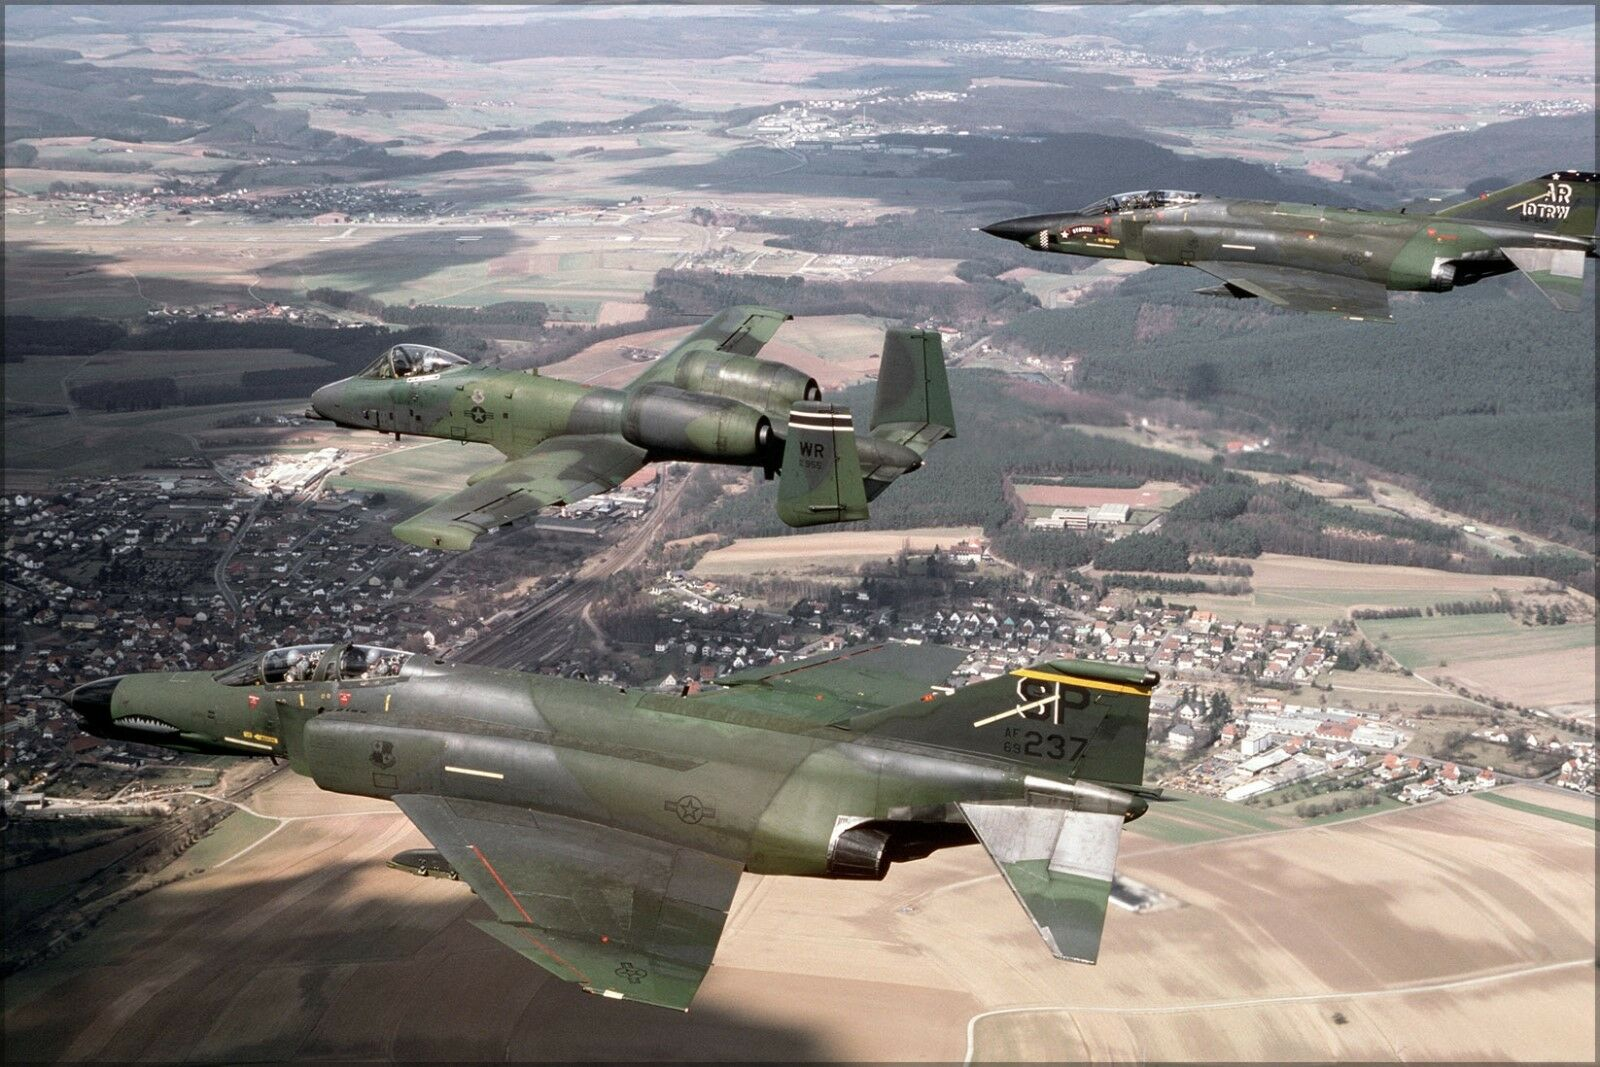 Poster, Molte Misure; F-4g Phantom II F-4, A-10a Thunderbolt A-10 A-10 A-10 Warthog 1987 667cb3